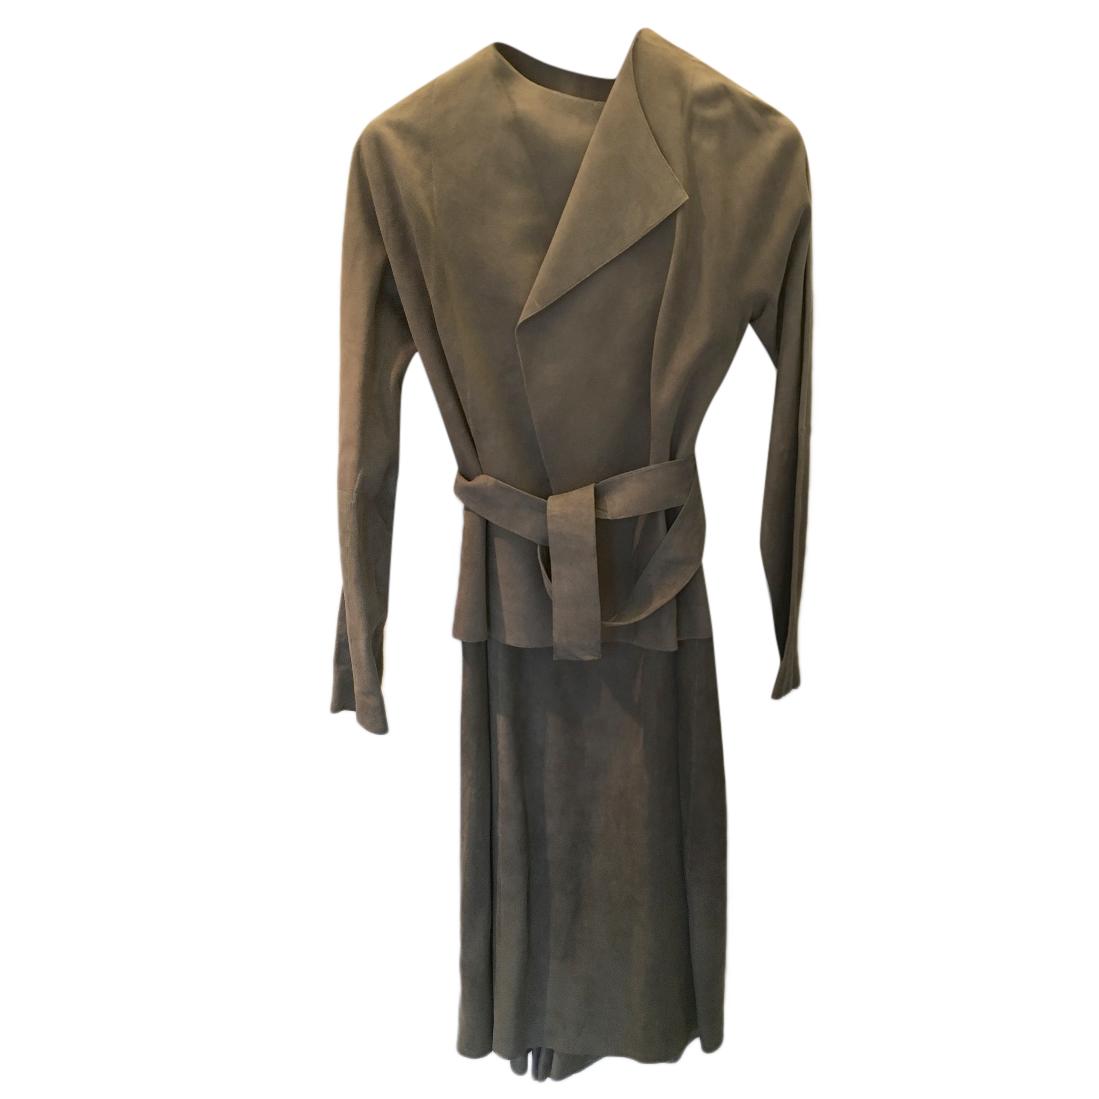 Amanda Wakeley Grey Suede Dress & Coat